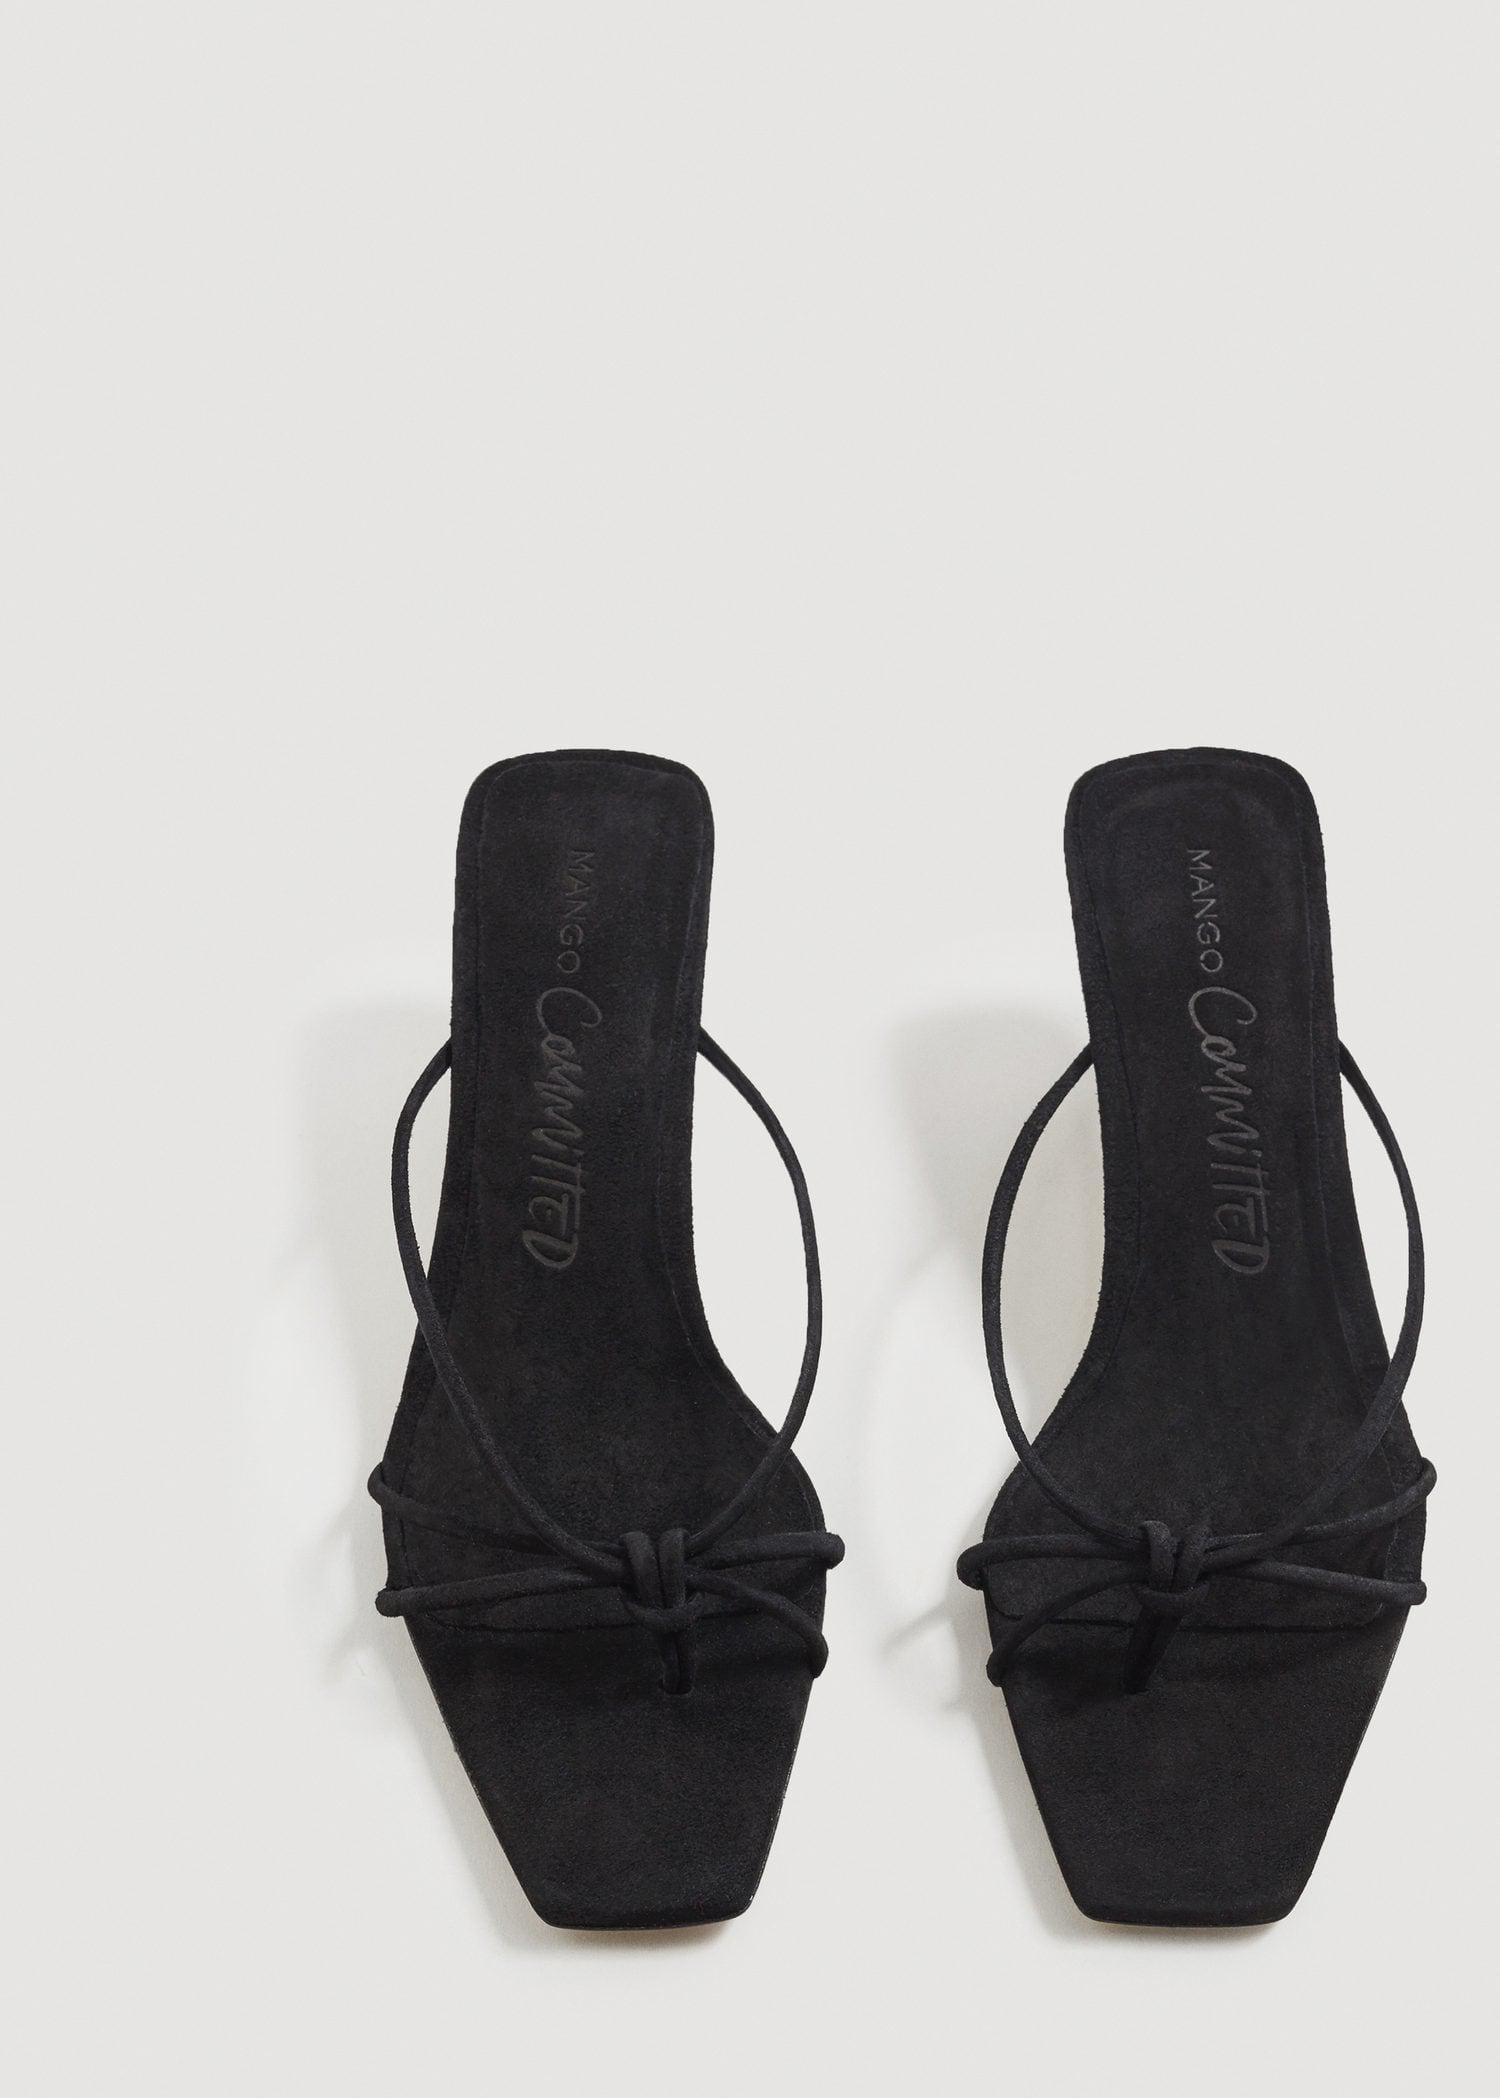 dac6679c121 Lyst - Mango Heel Leather Sandals in Black